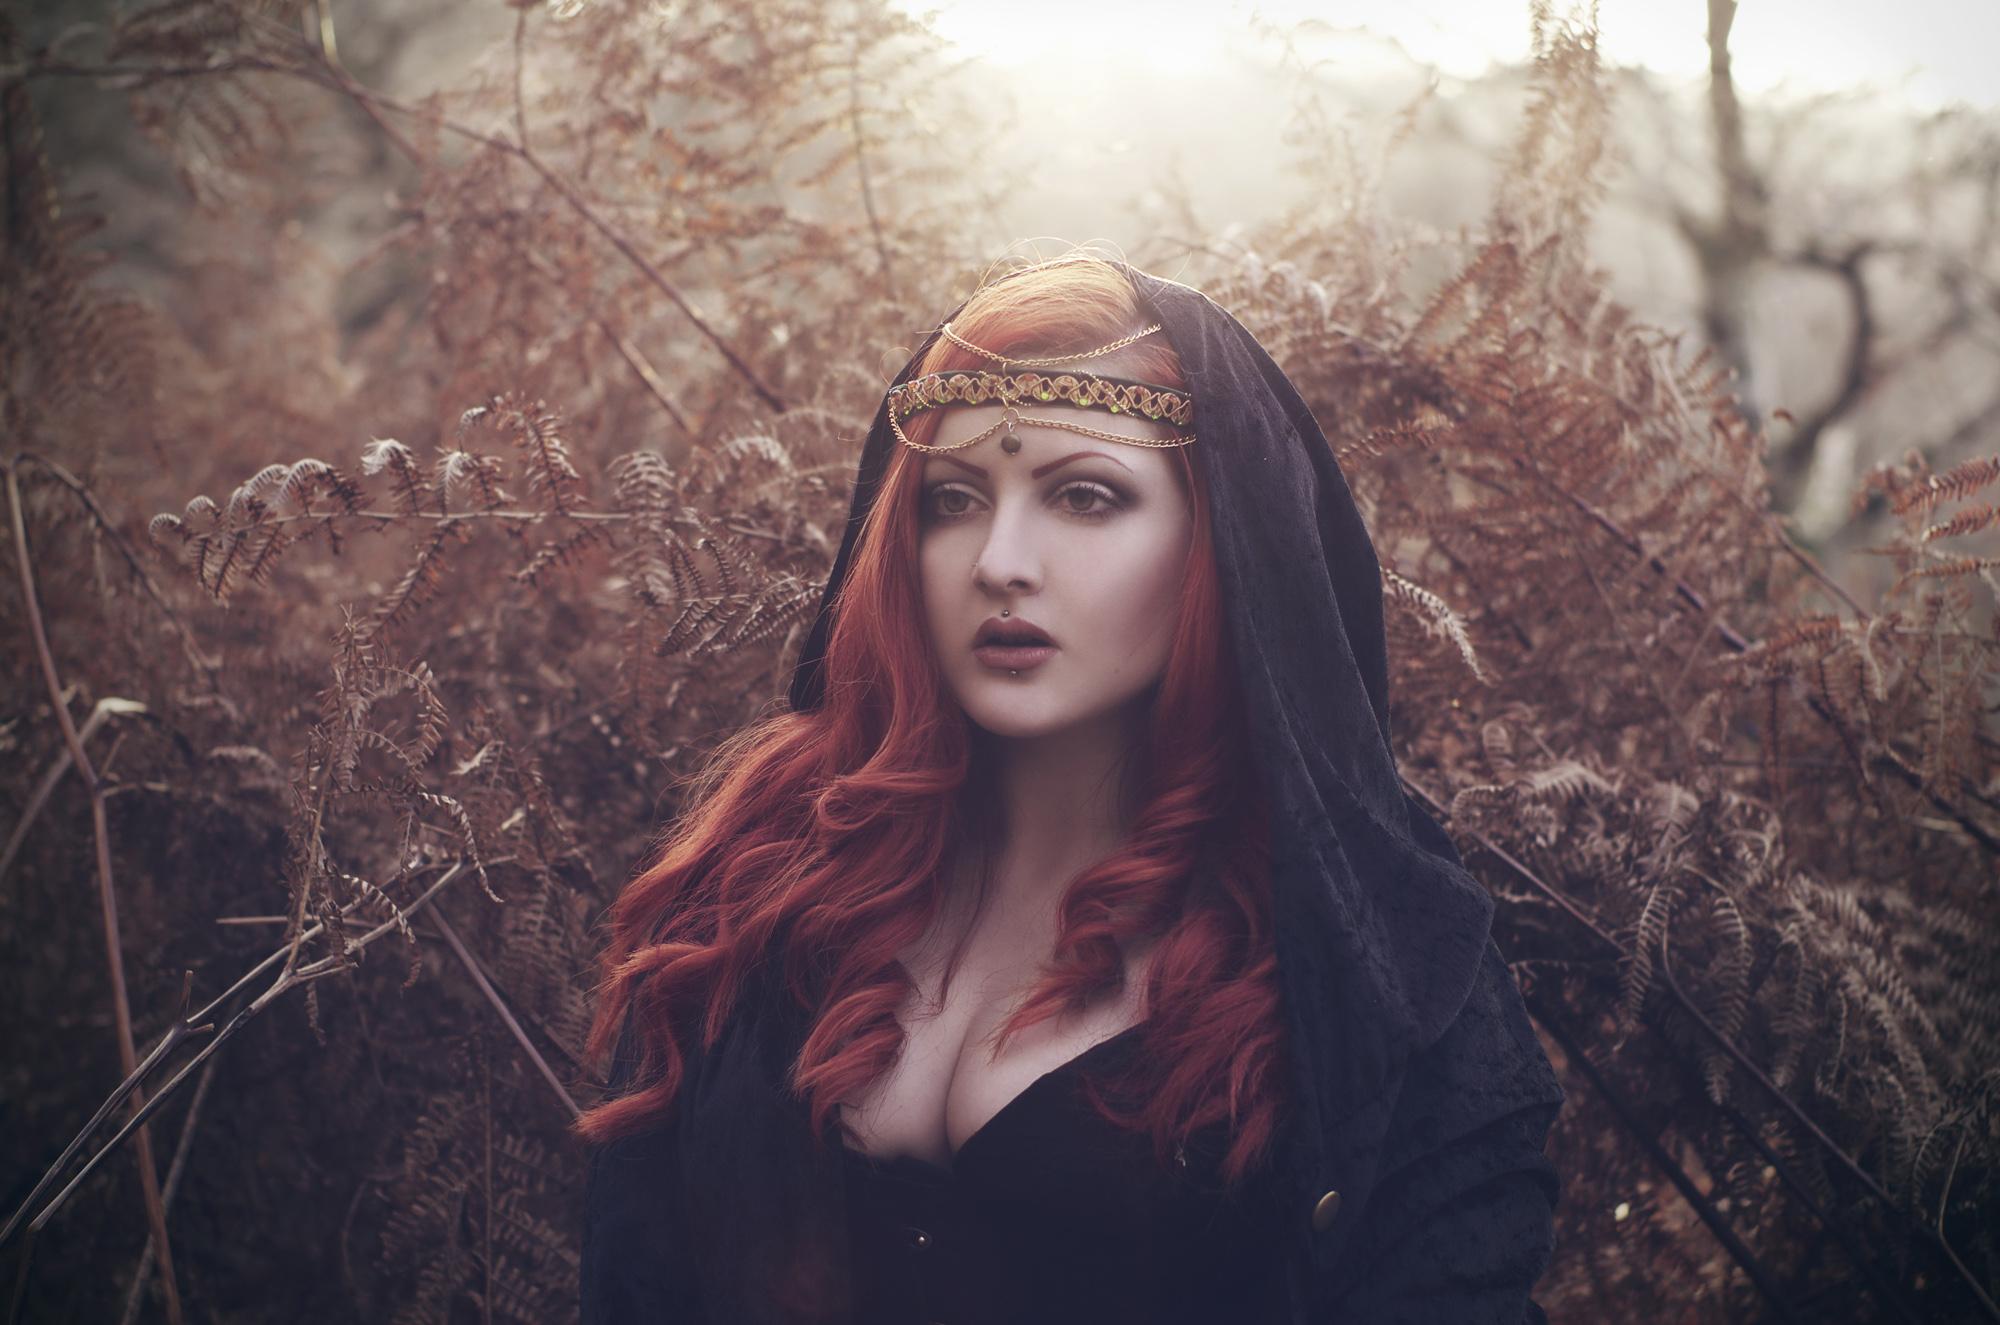 Charis Talbot Photography - Abi Rose Alternative Model - jewelry PendulousThreadsUK